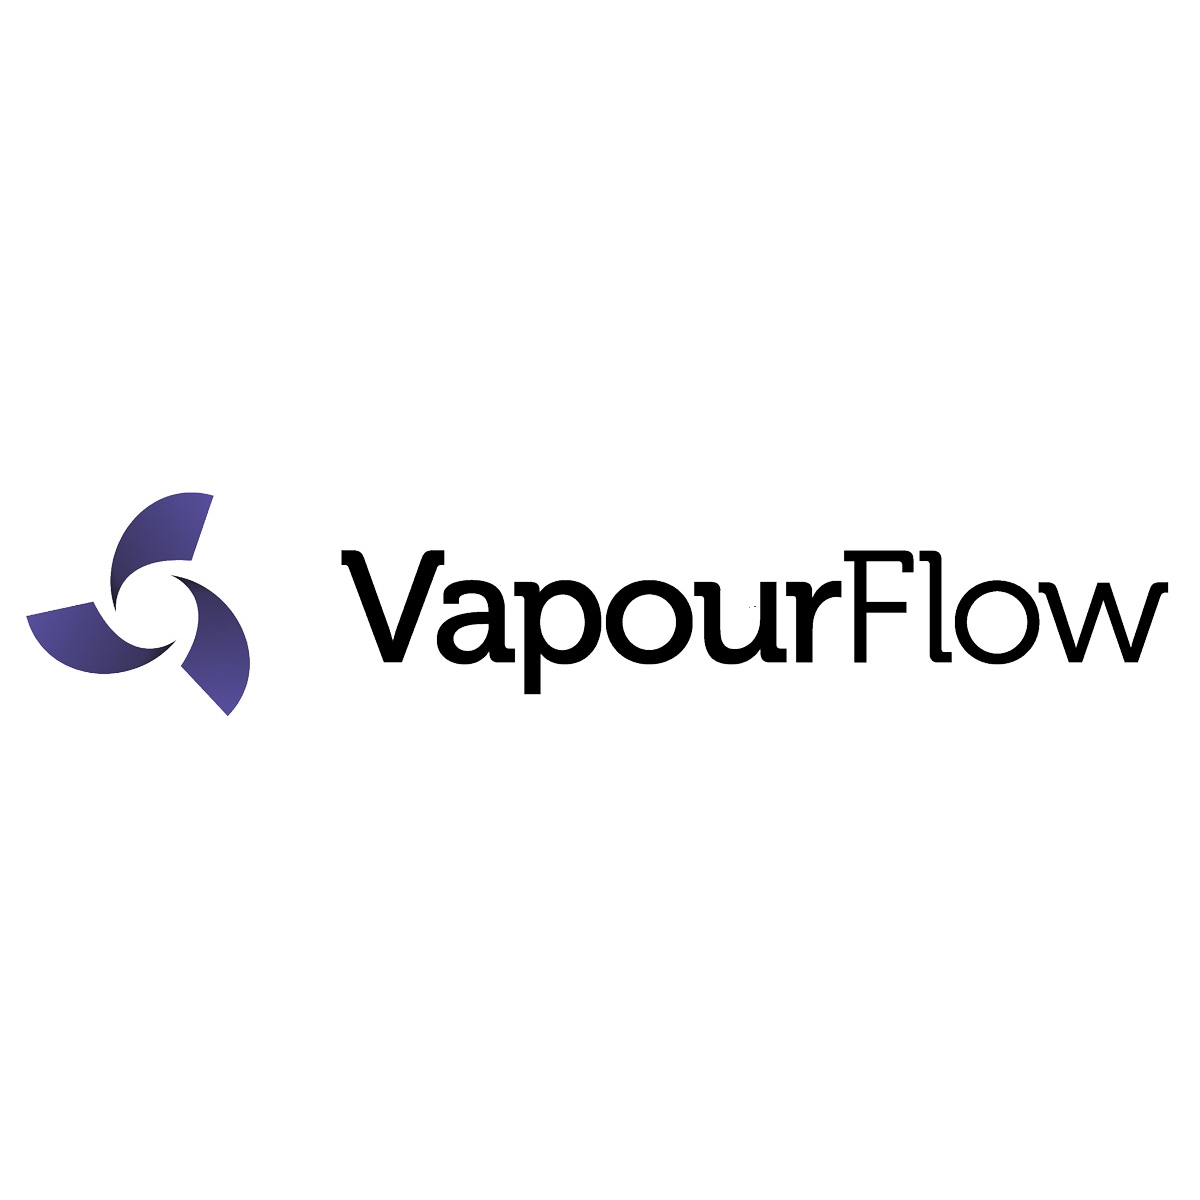 Vapourflow